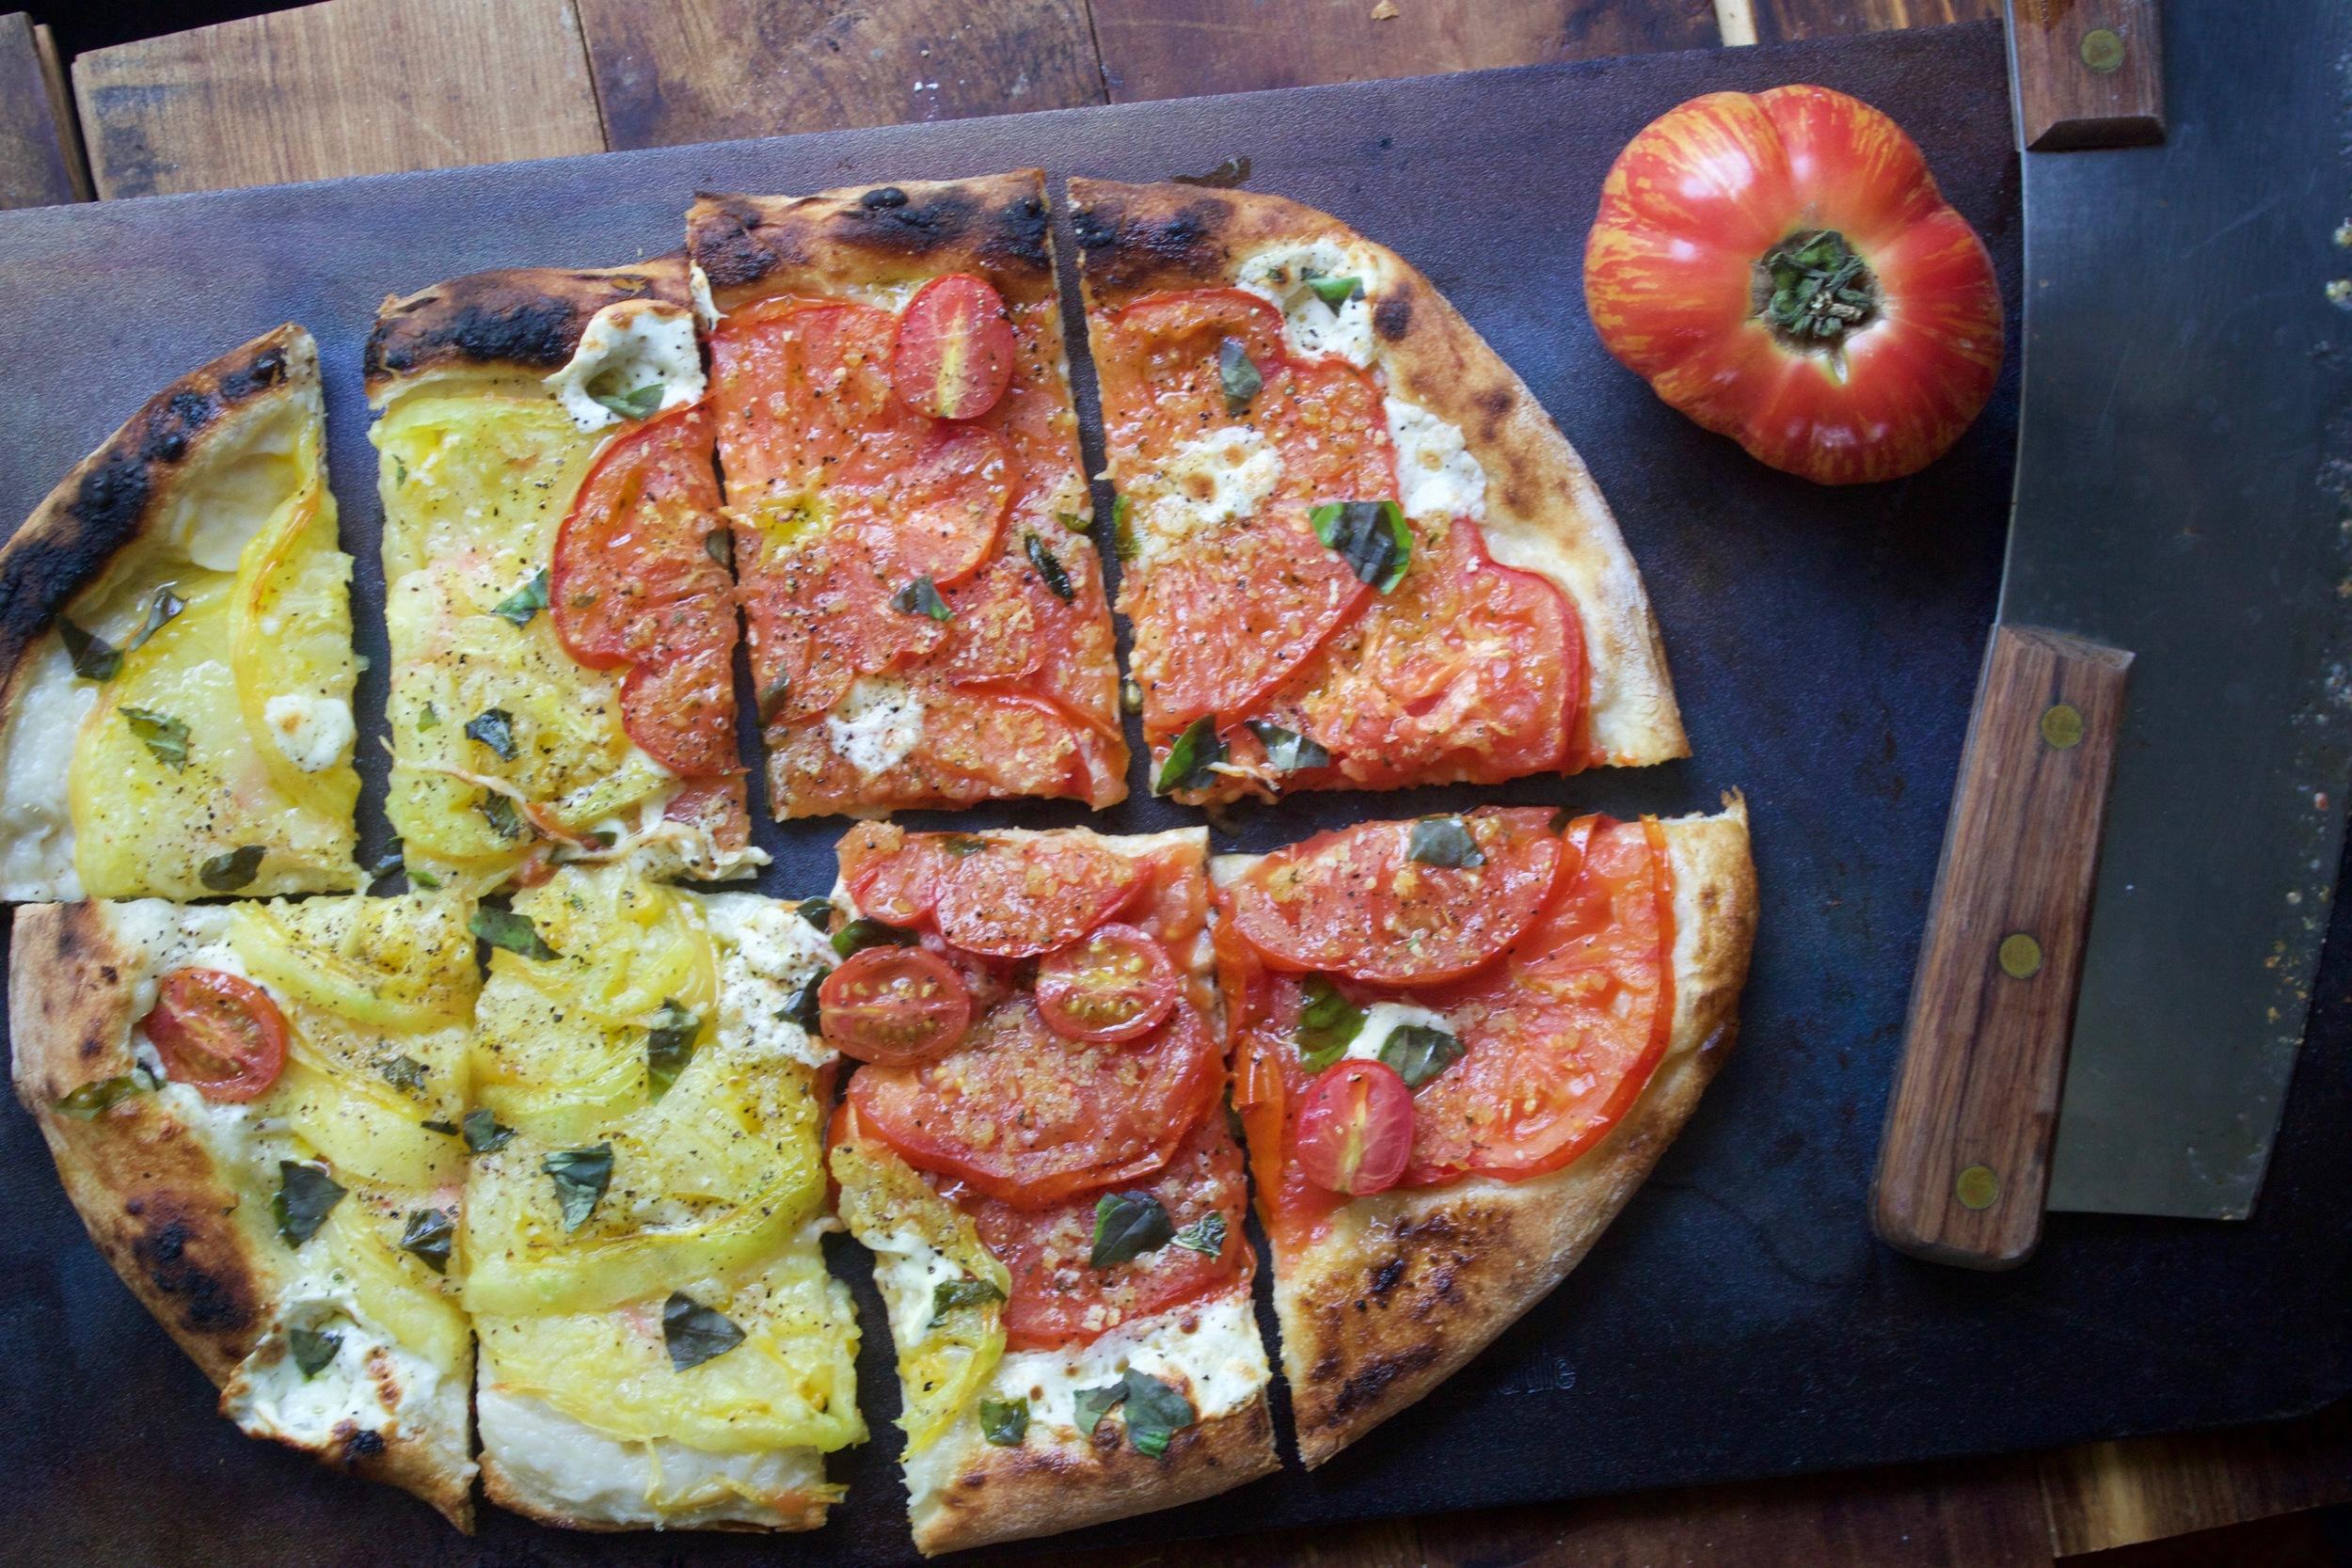 Tomato pizza on a Baking Steel